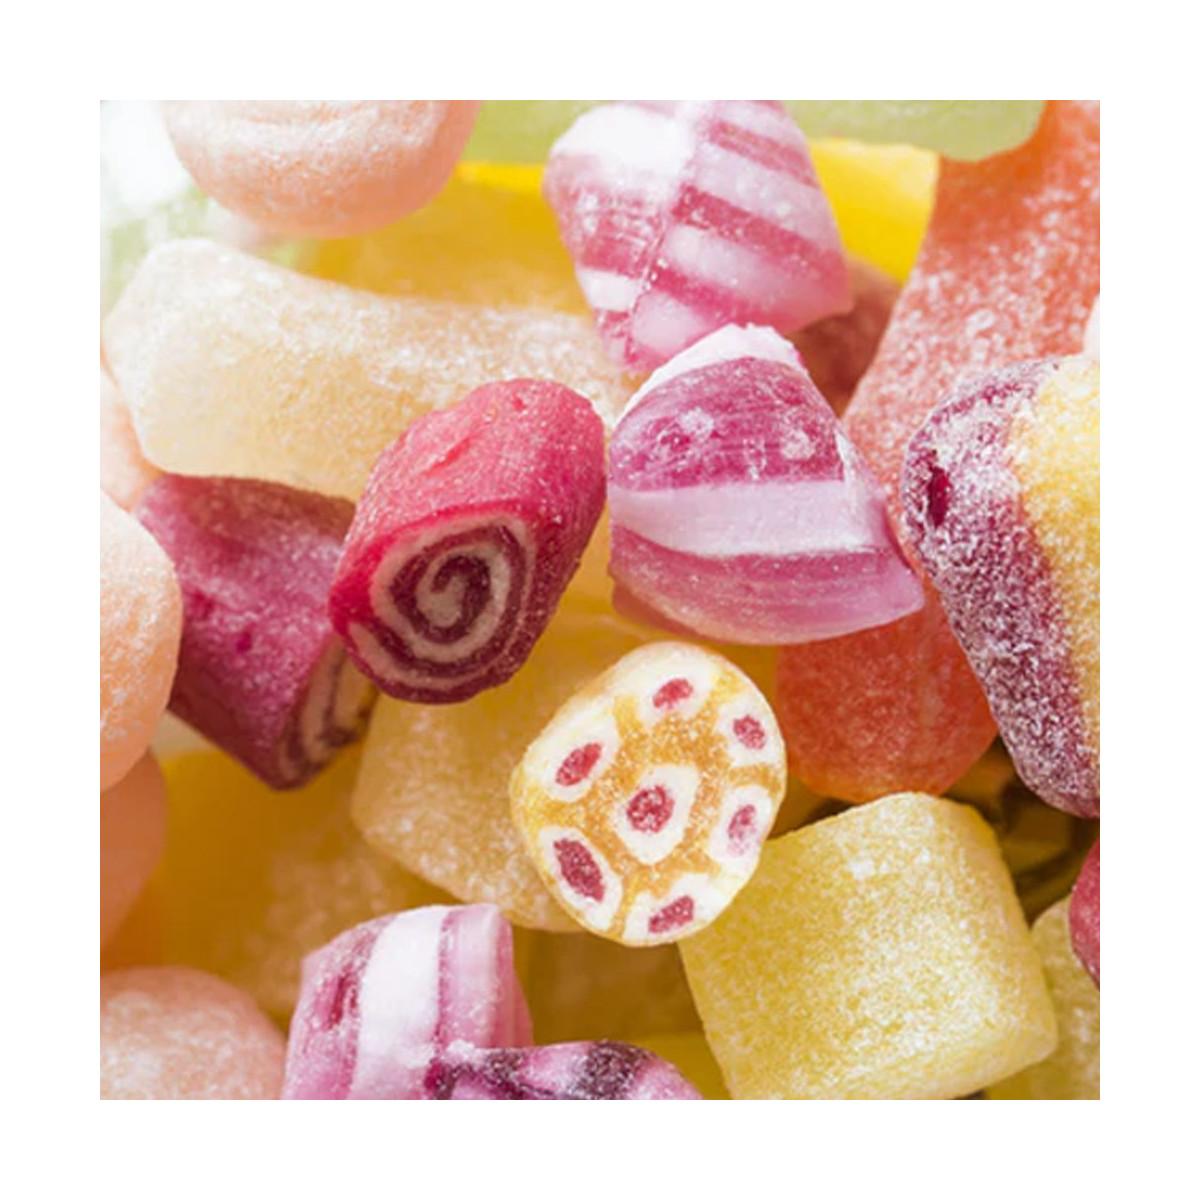 Fragrance Crash bonbons